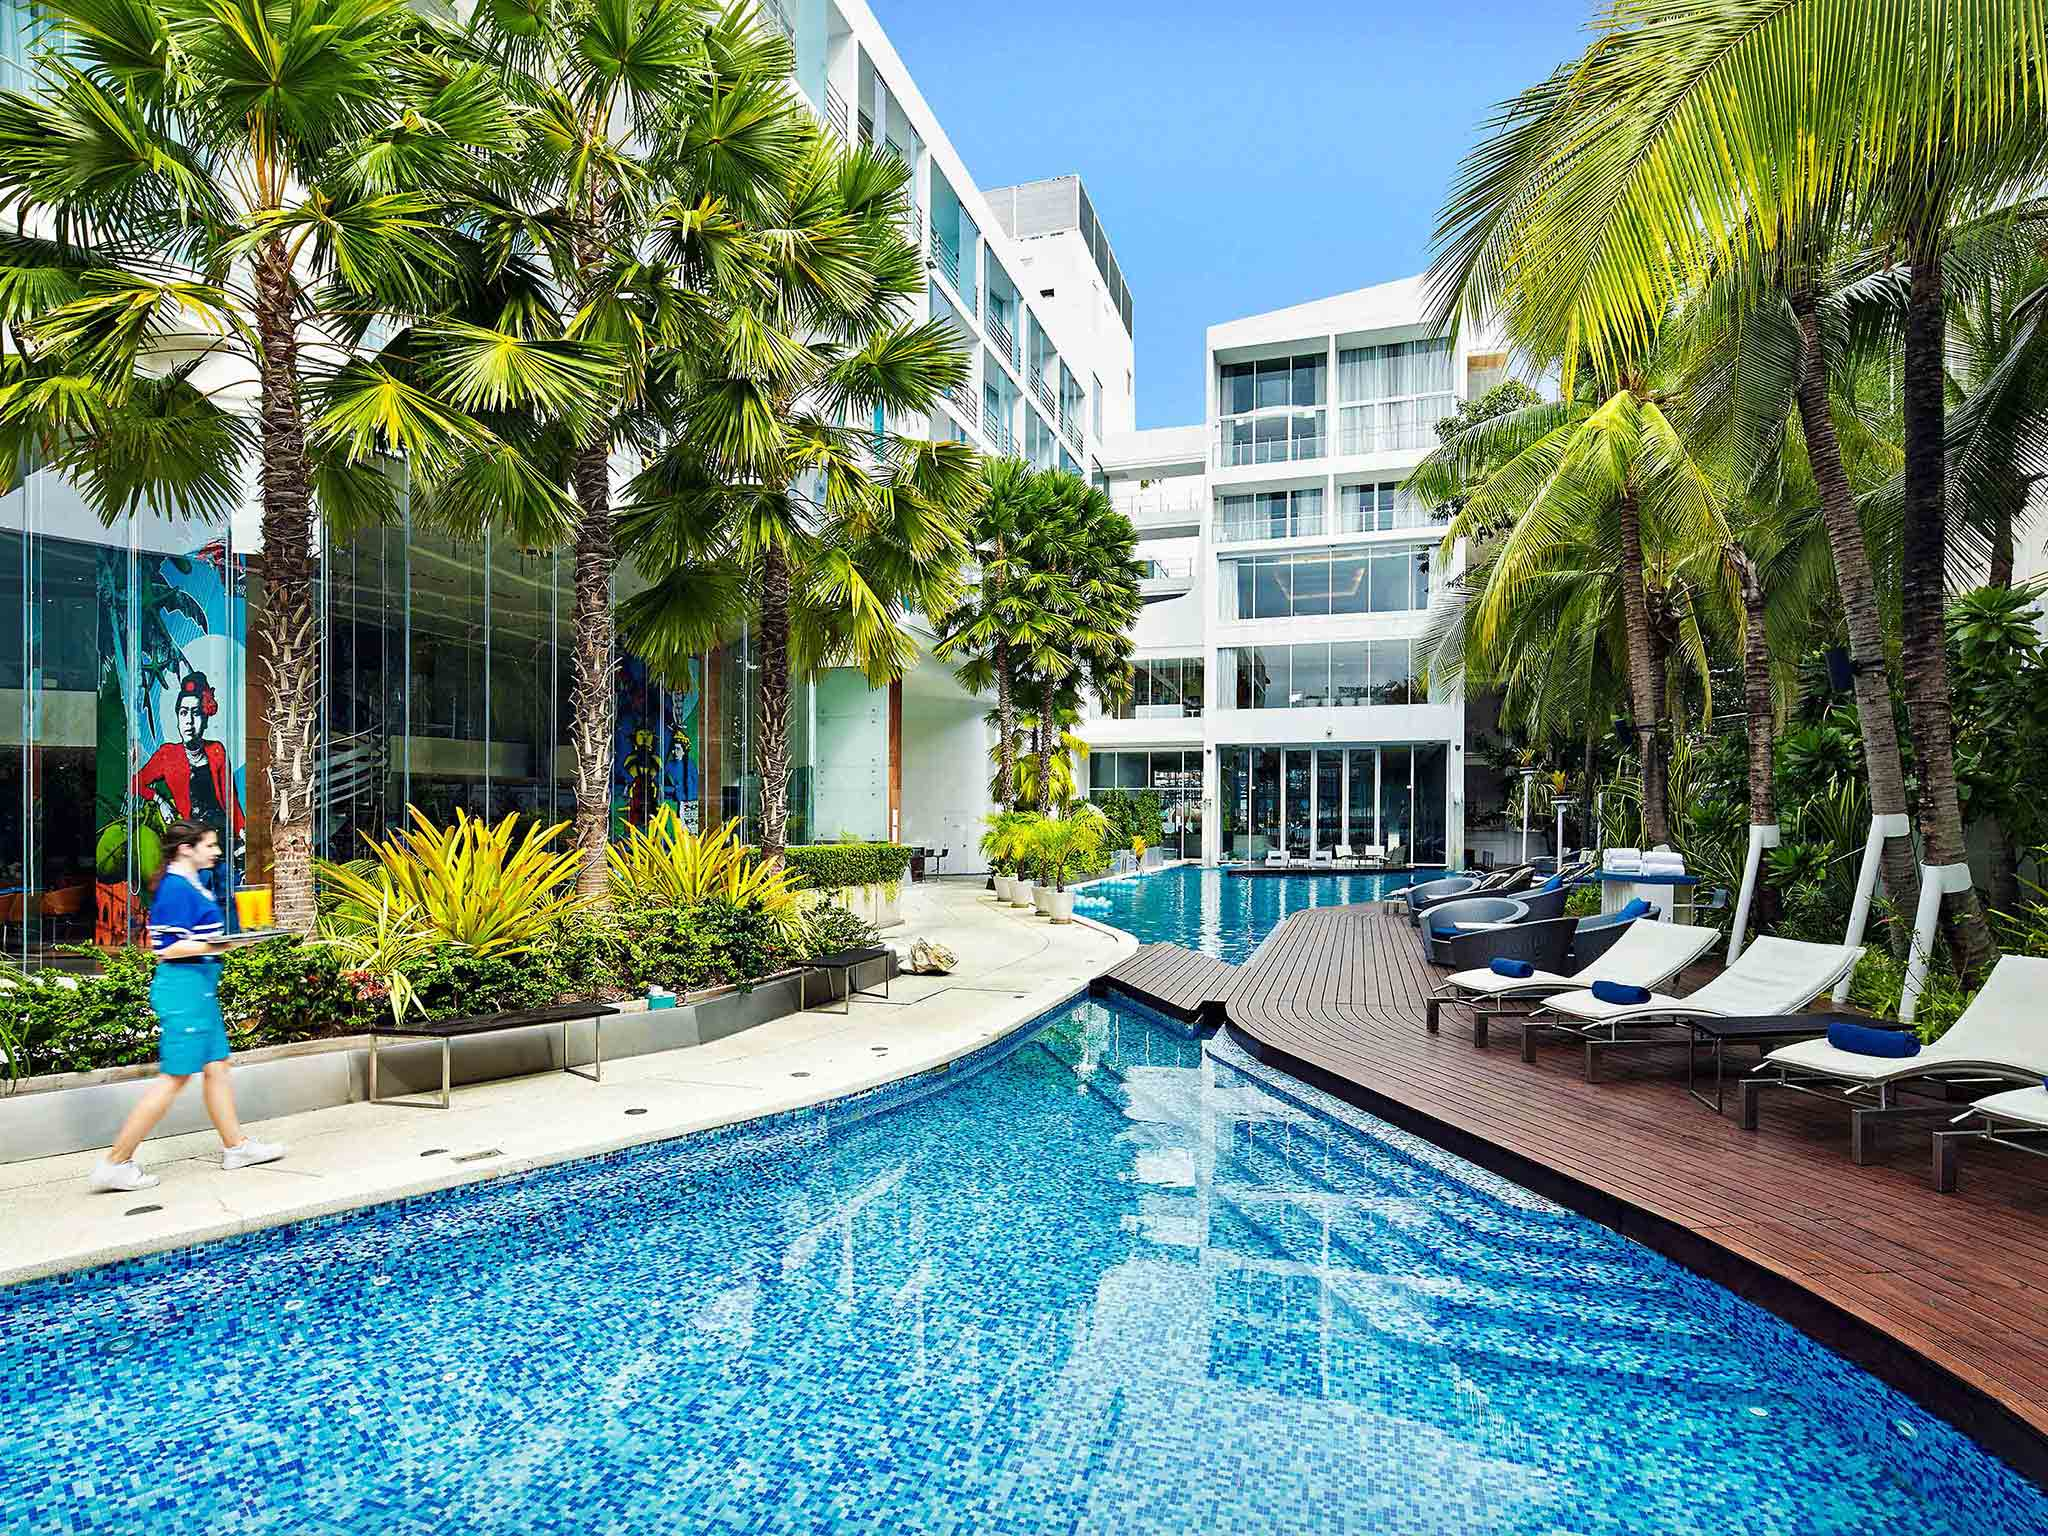 Hotel in PATTAYA - Baraquda Pattaya - MGallery by Sofitel